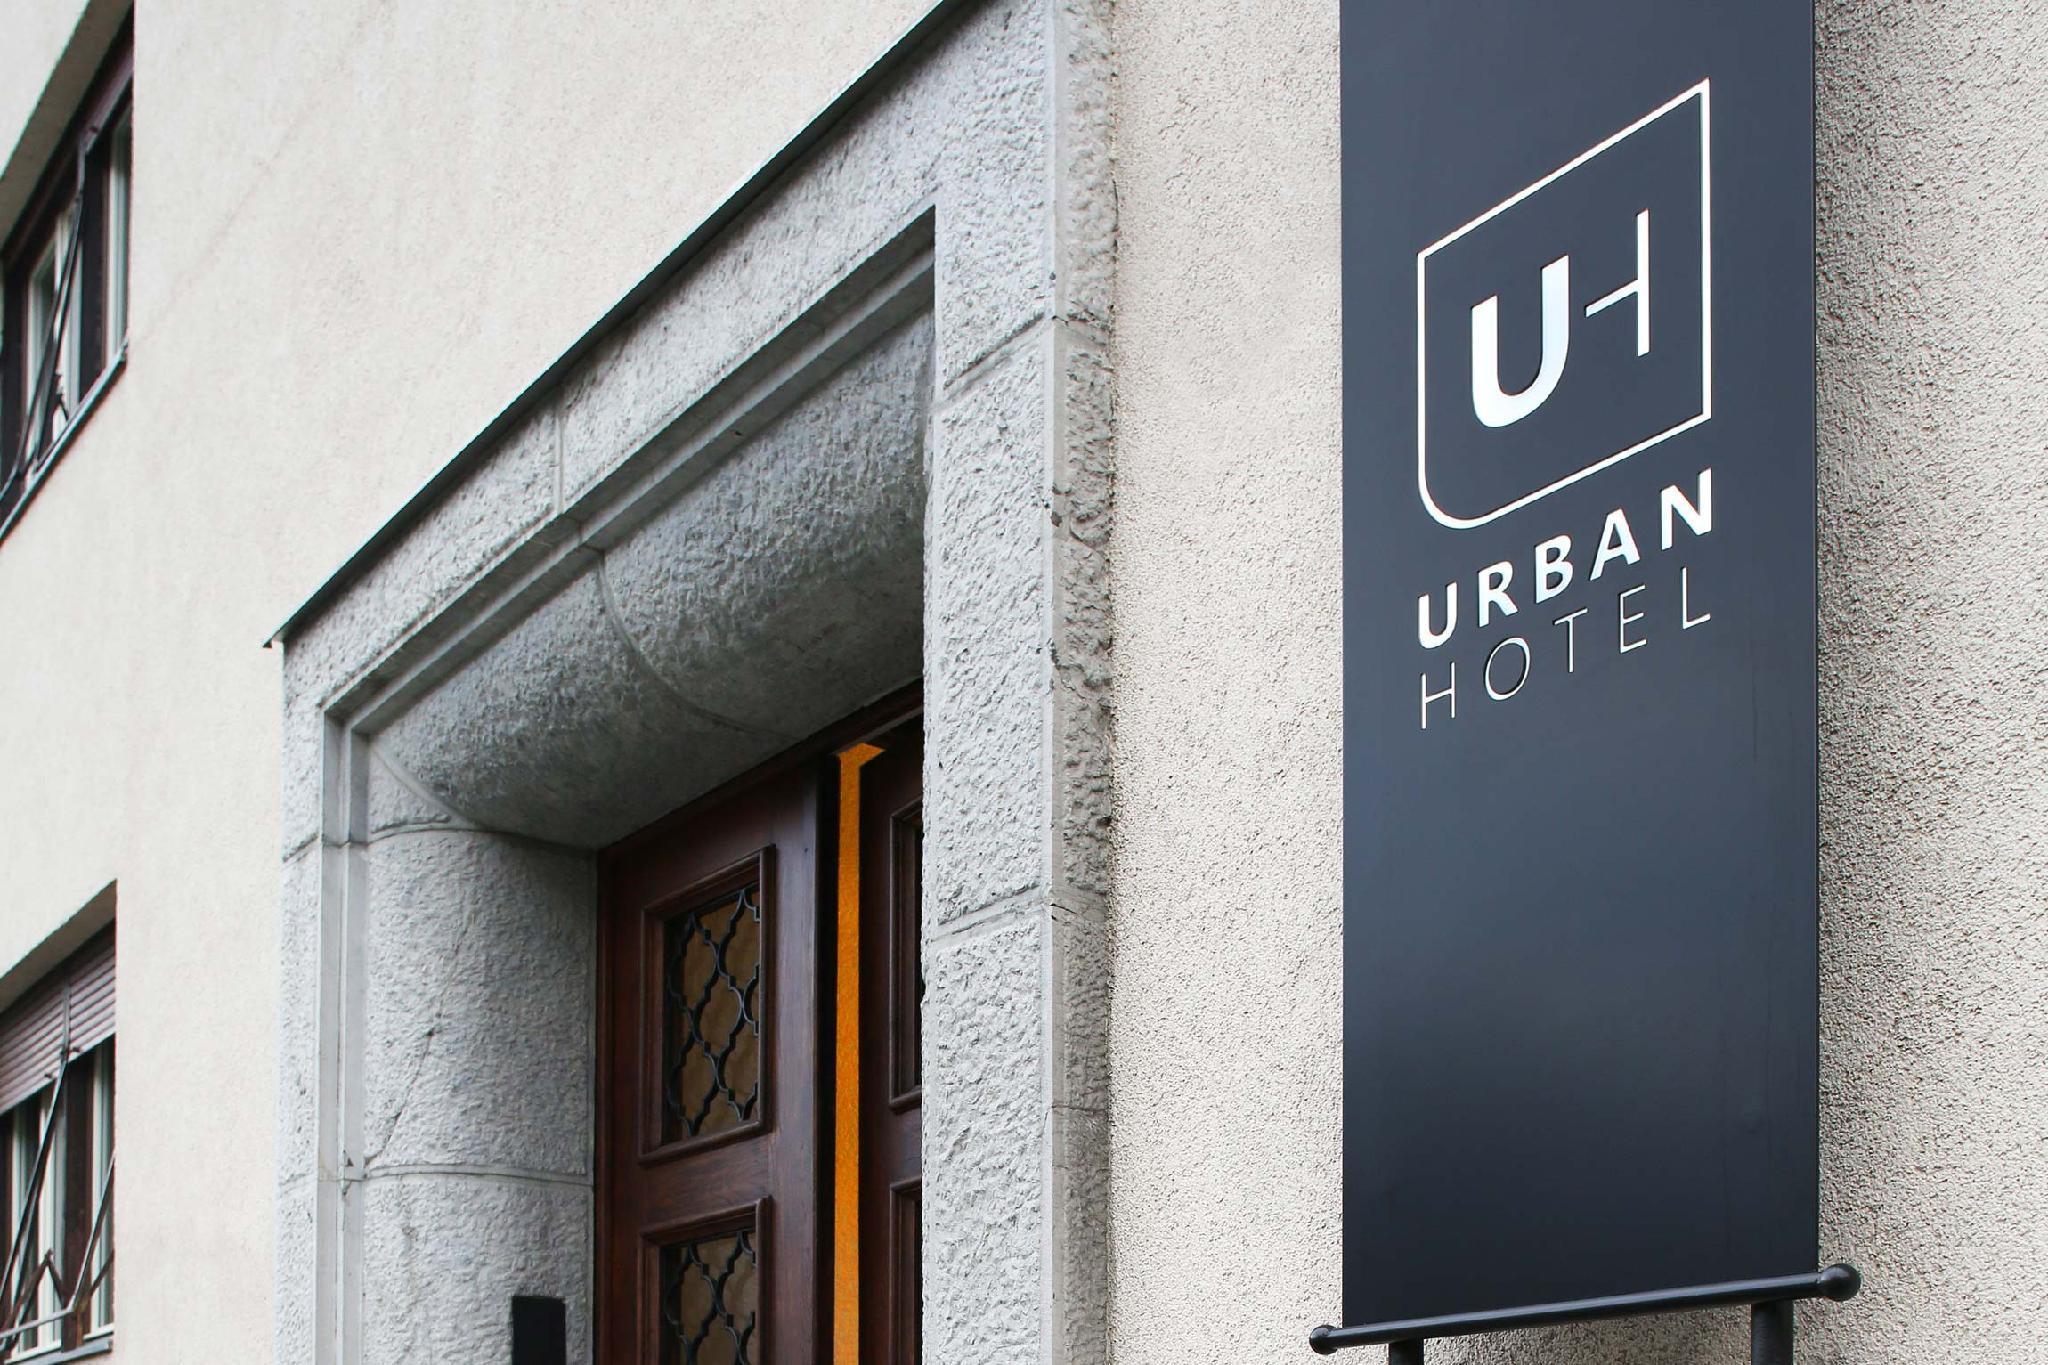 Urban Hotel Ljubljana